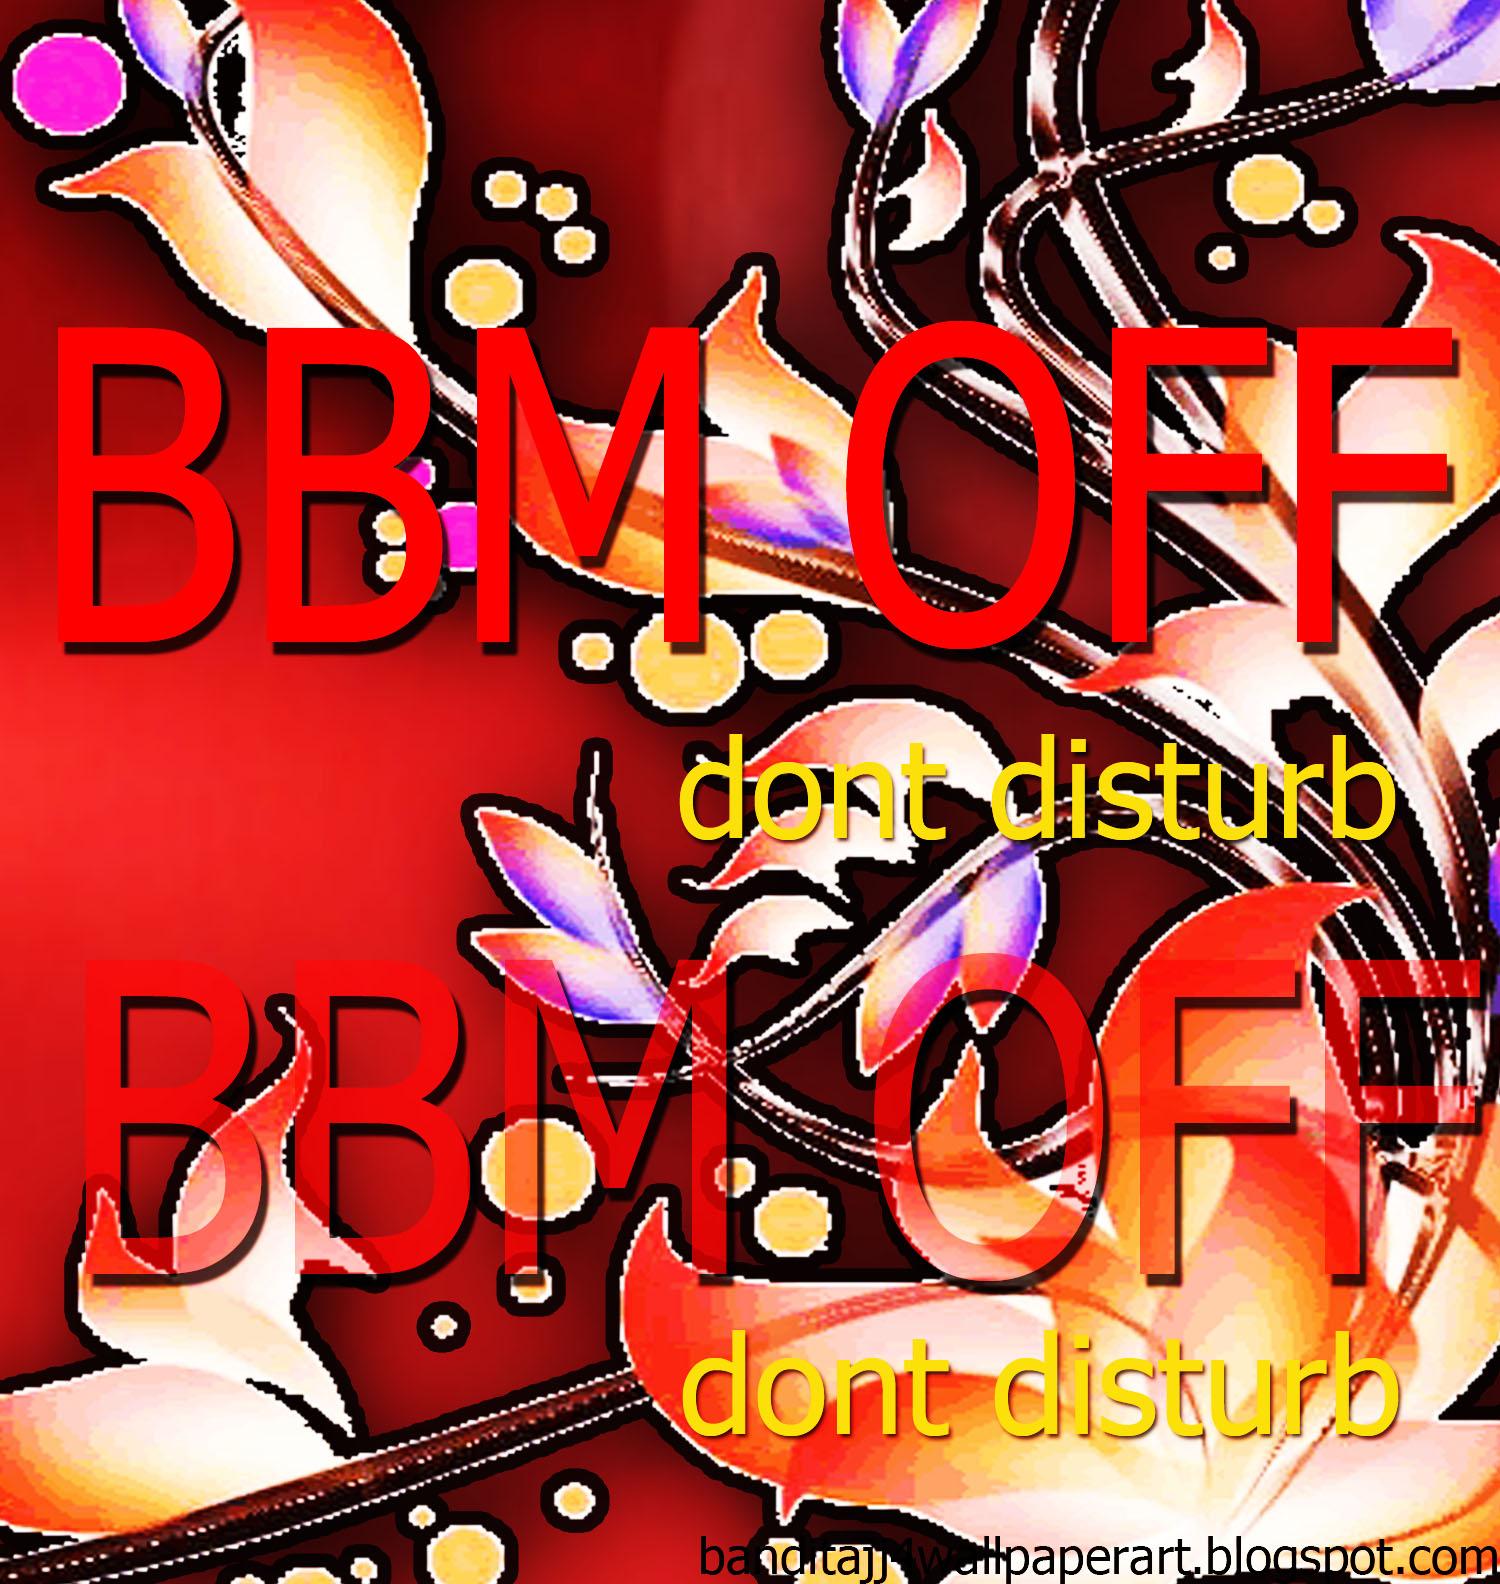 http://2.bp.blogspot.com/-LCU6_1Lm_mg/Tu-NbNqwcvI/AAAAAAAABFk/Rl5Z99ChWhY/s1600/blackberry_BBM_OFF_Images_Picture_by_banditajj4wallpaperart.jpg